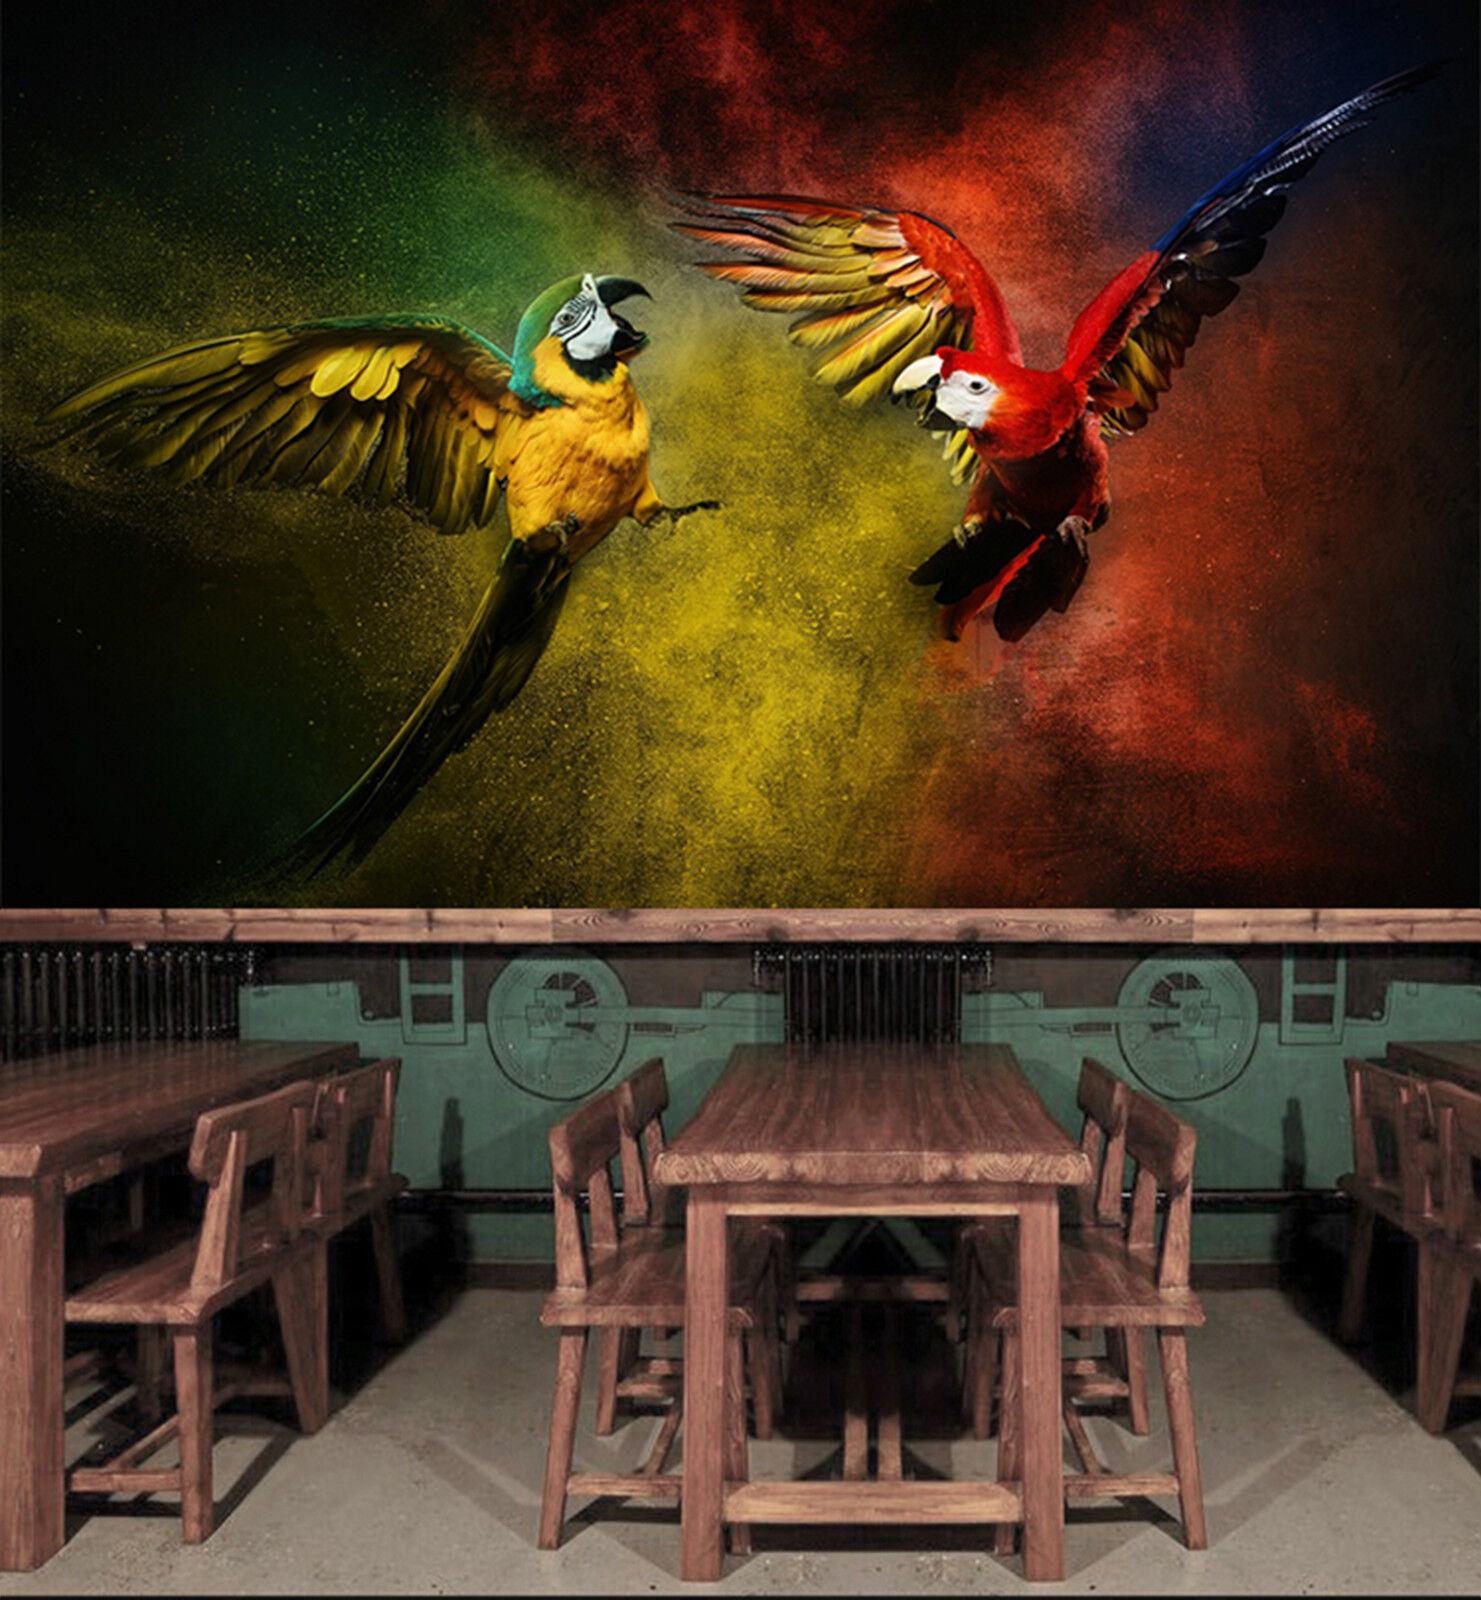 3D Gefechts 3655 Fototapeten Wandbild Fototapete Bild Tapete Familie Kinder DE